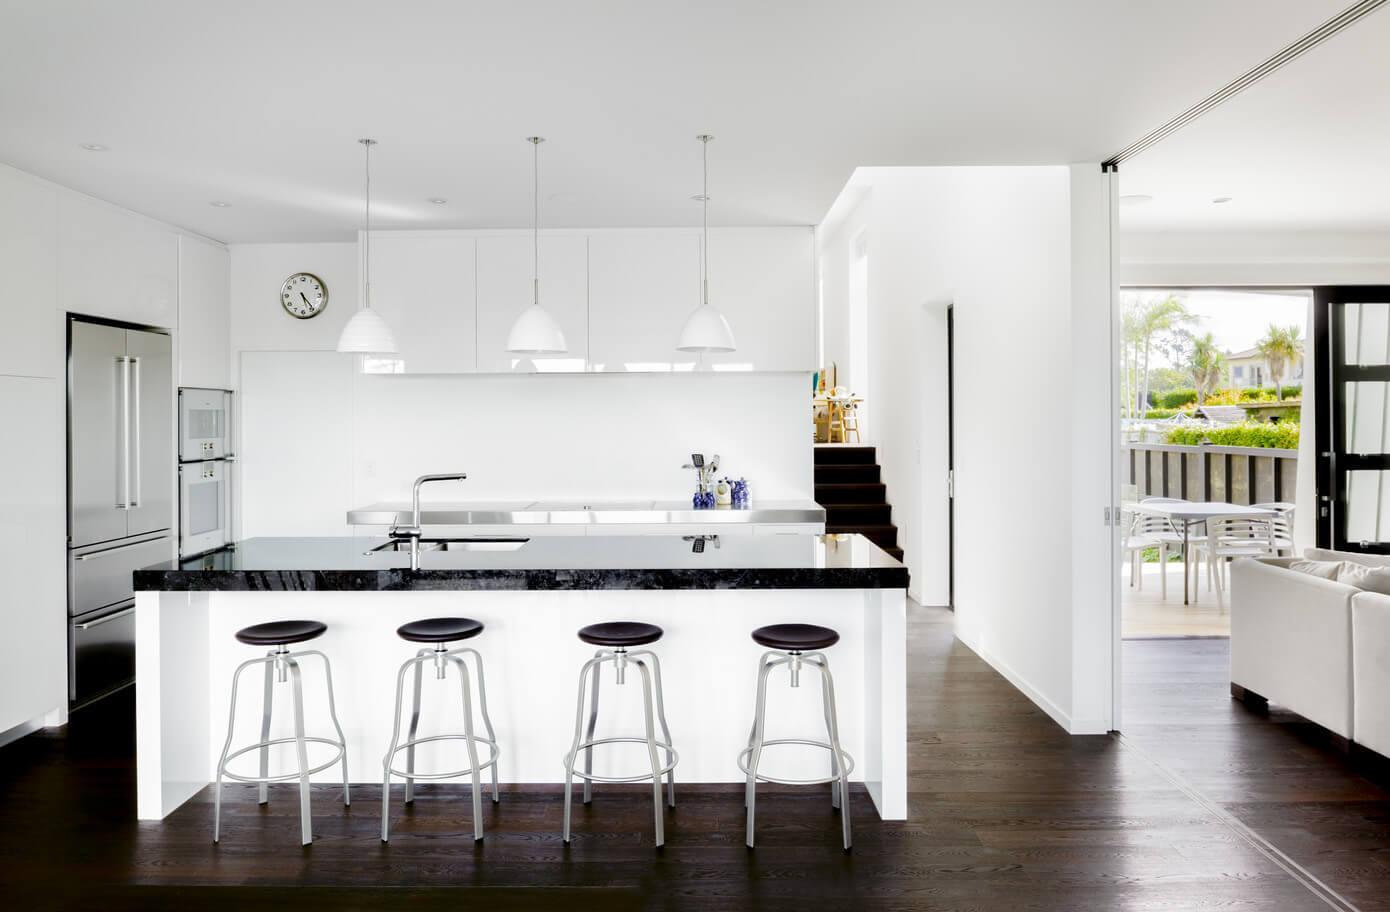 mclaren-house-archaus-architects-07